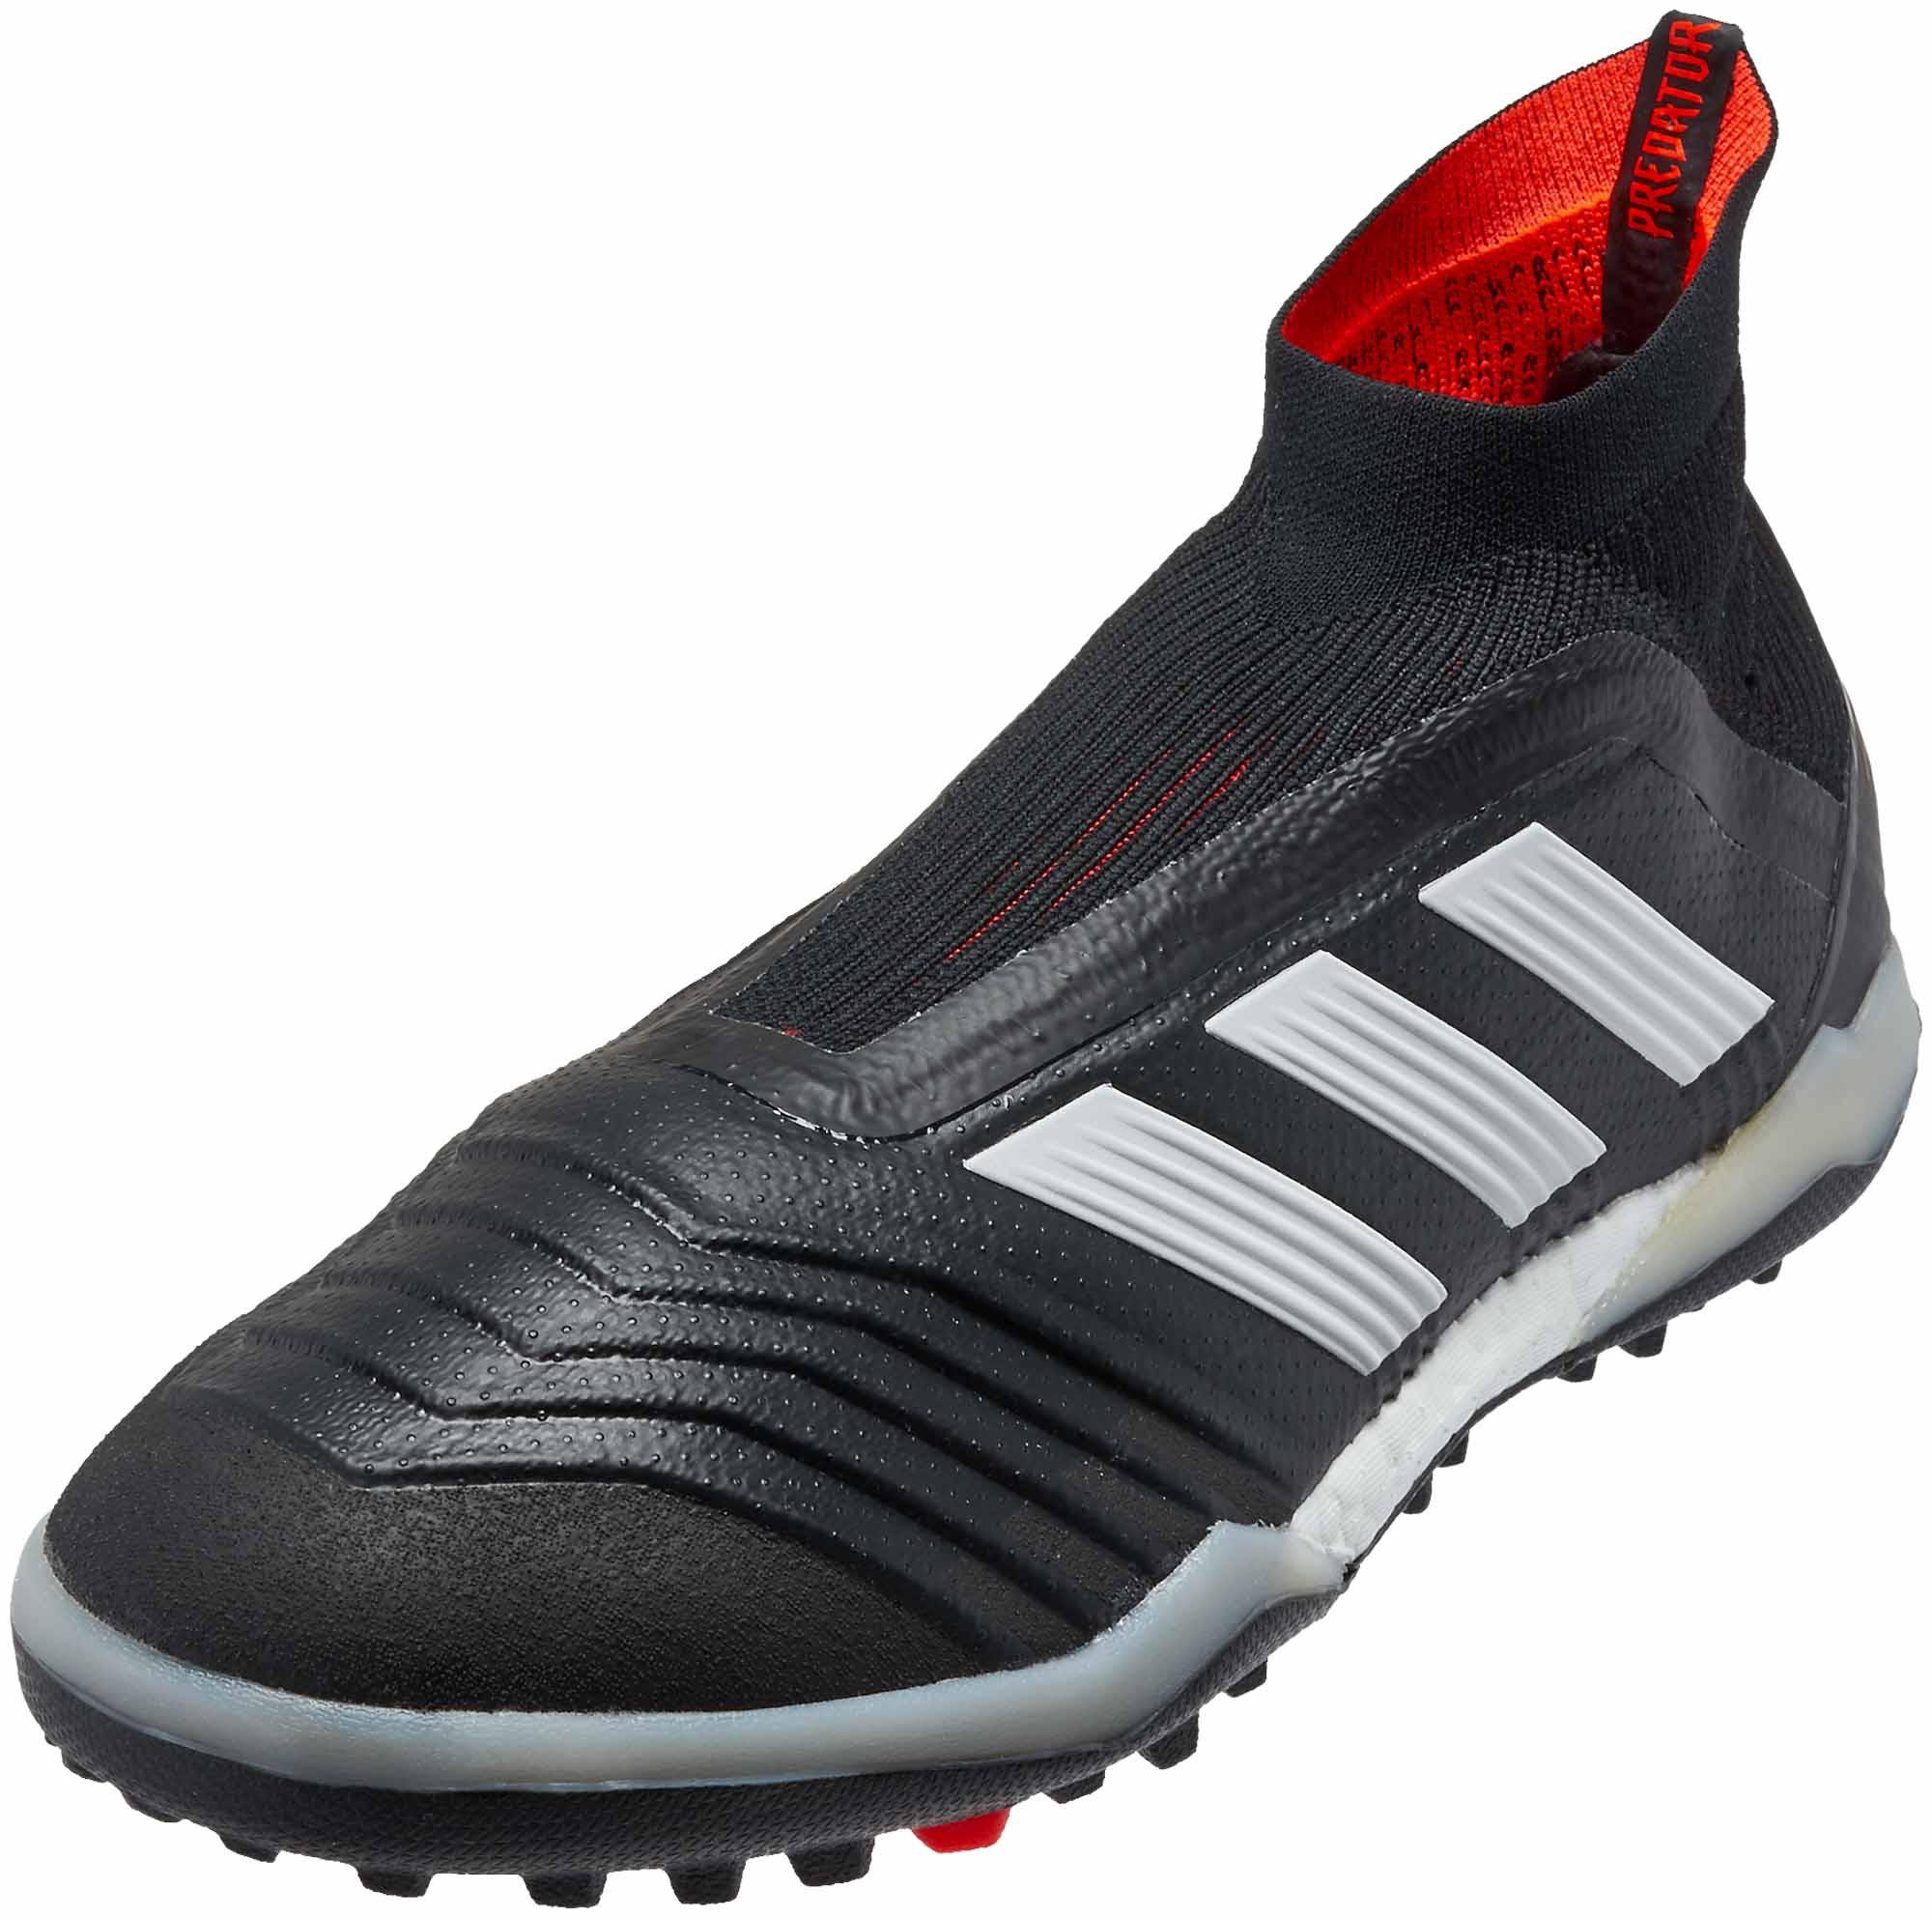 05b2900d7 adidas Predator Tango 18 TF - Black & Solar Red